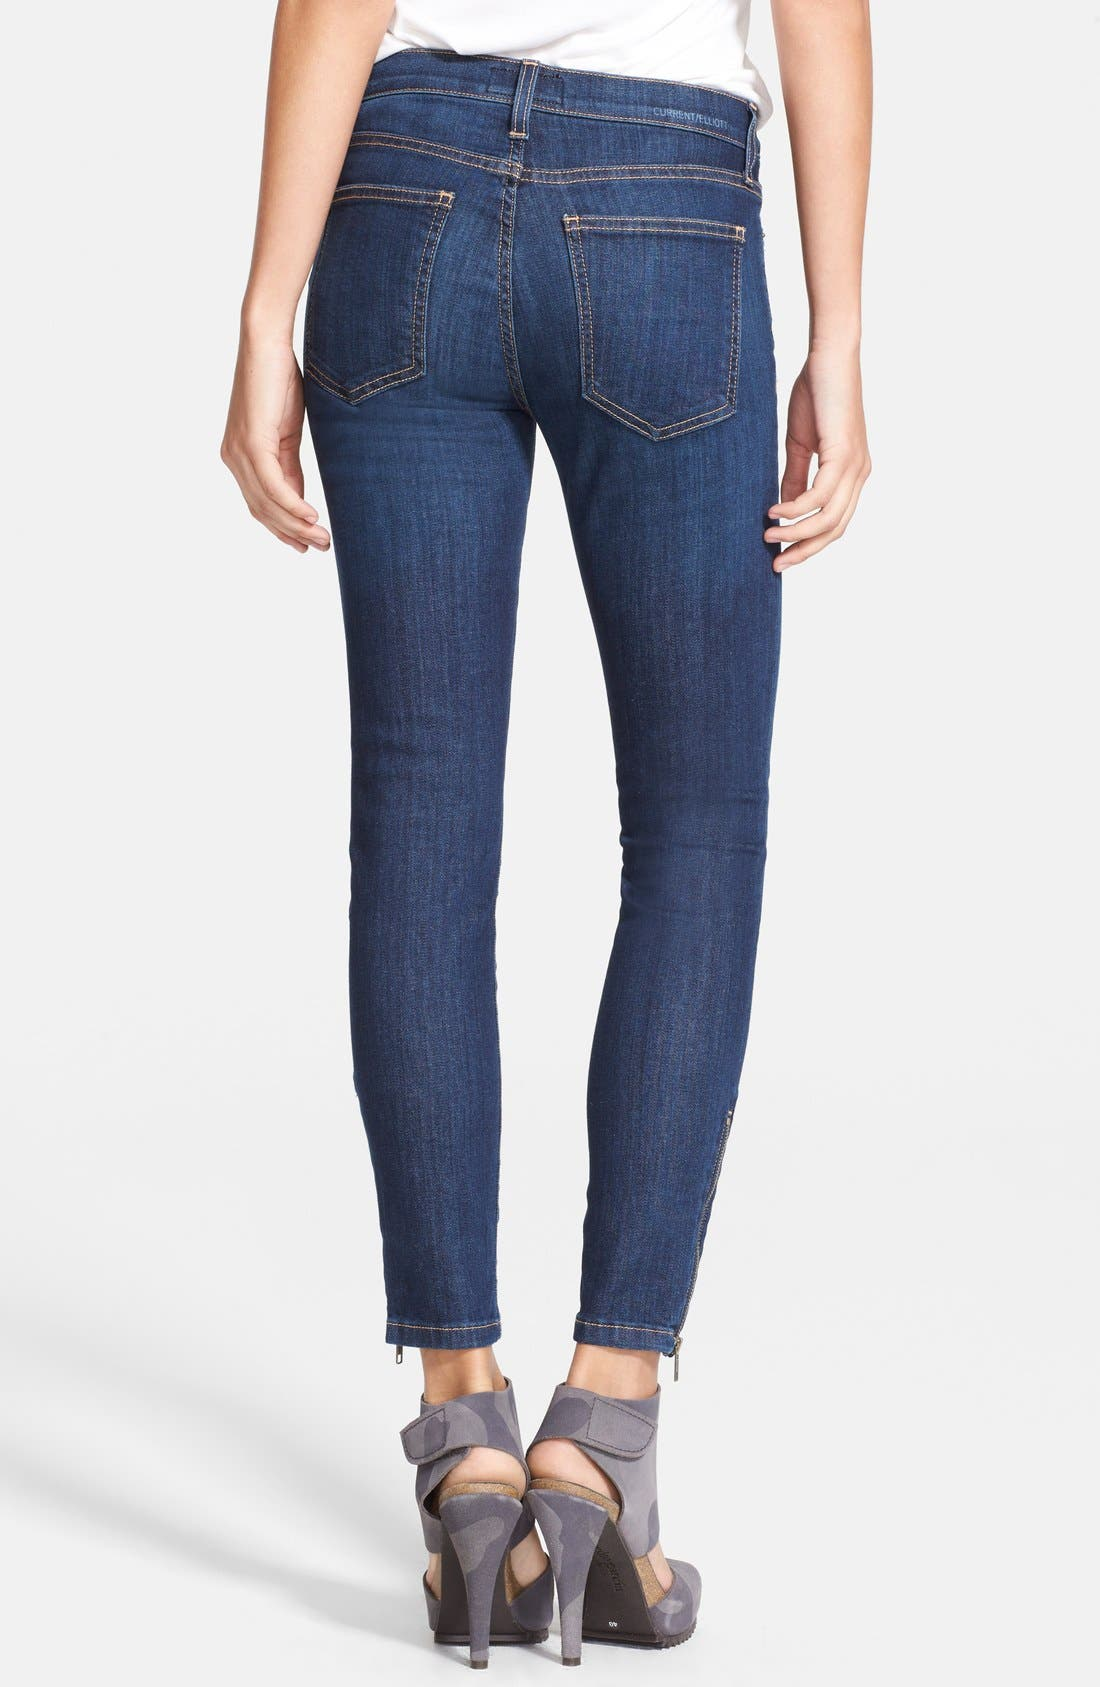 Alternate Image 2  - Current/Elliott 'The Zip Stiletto' Skinny Jeans (Bowler)